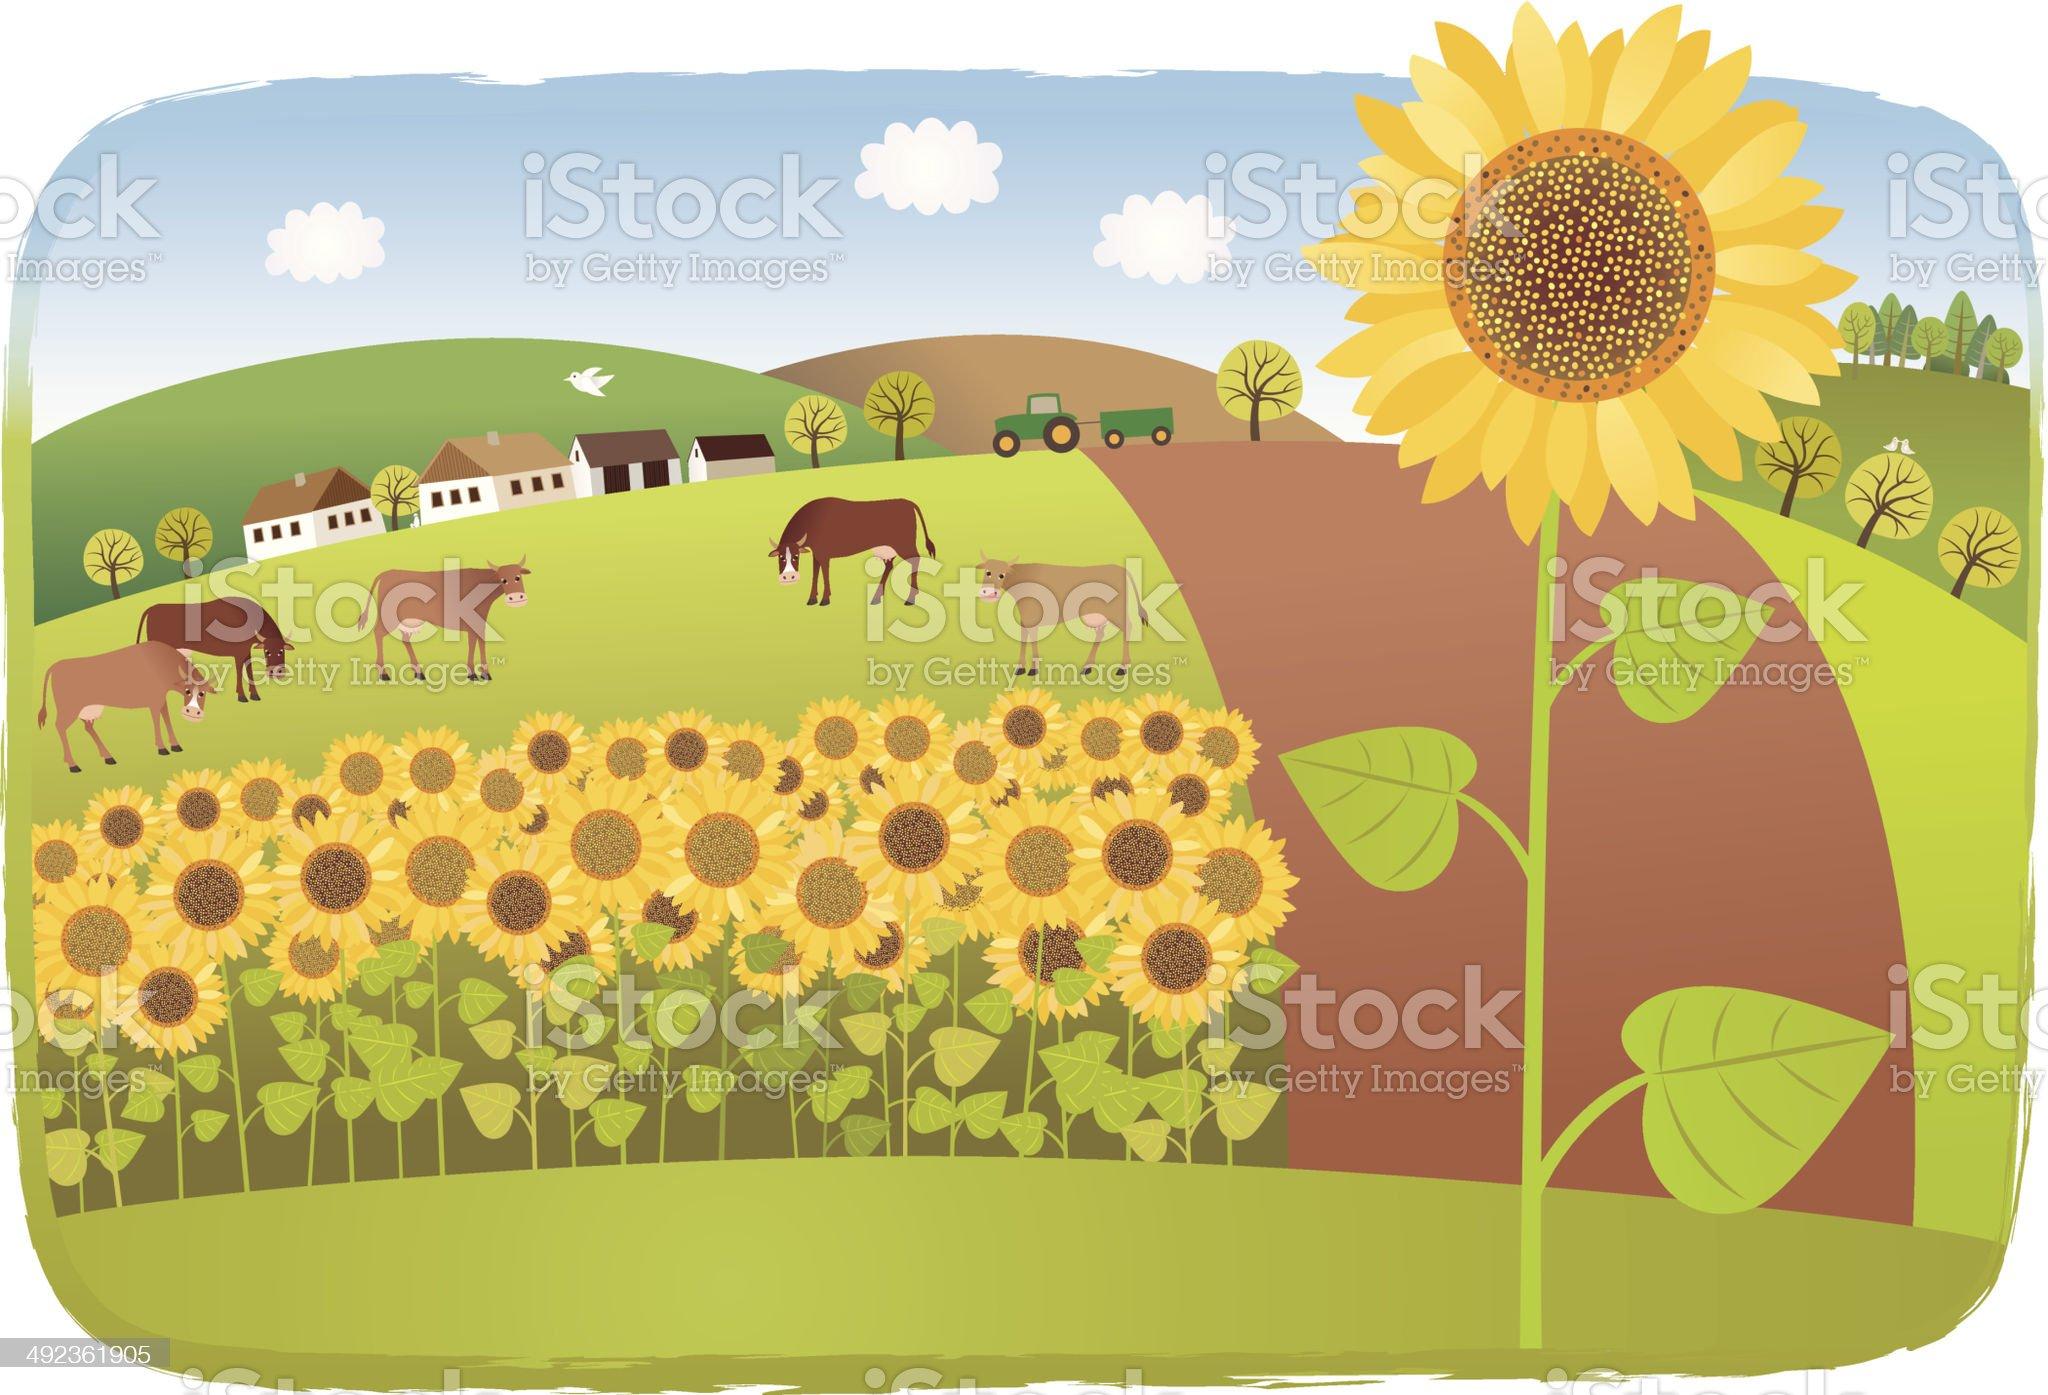 Sunflower fields royalty-free stock vector art